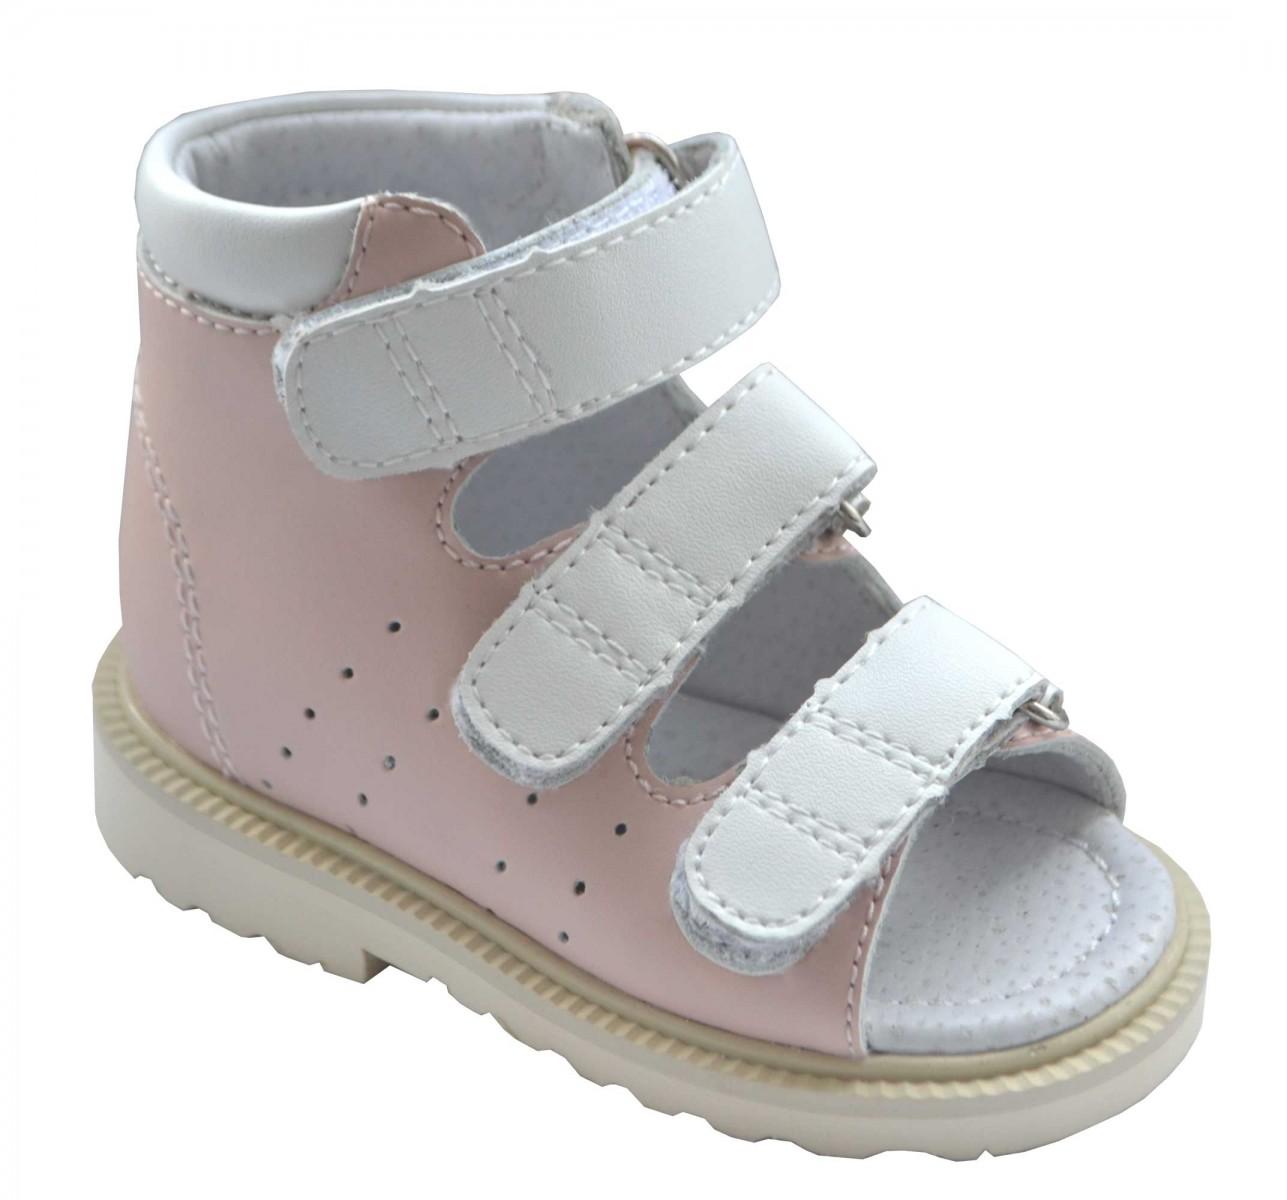 a083e51f8 Босоножки ортопедические детские, сандалии летние | Производитель ...